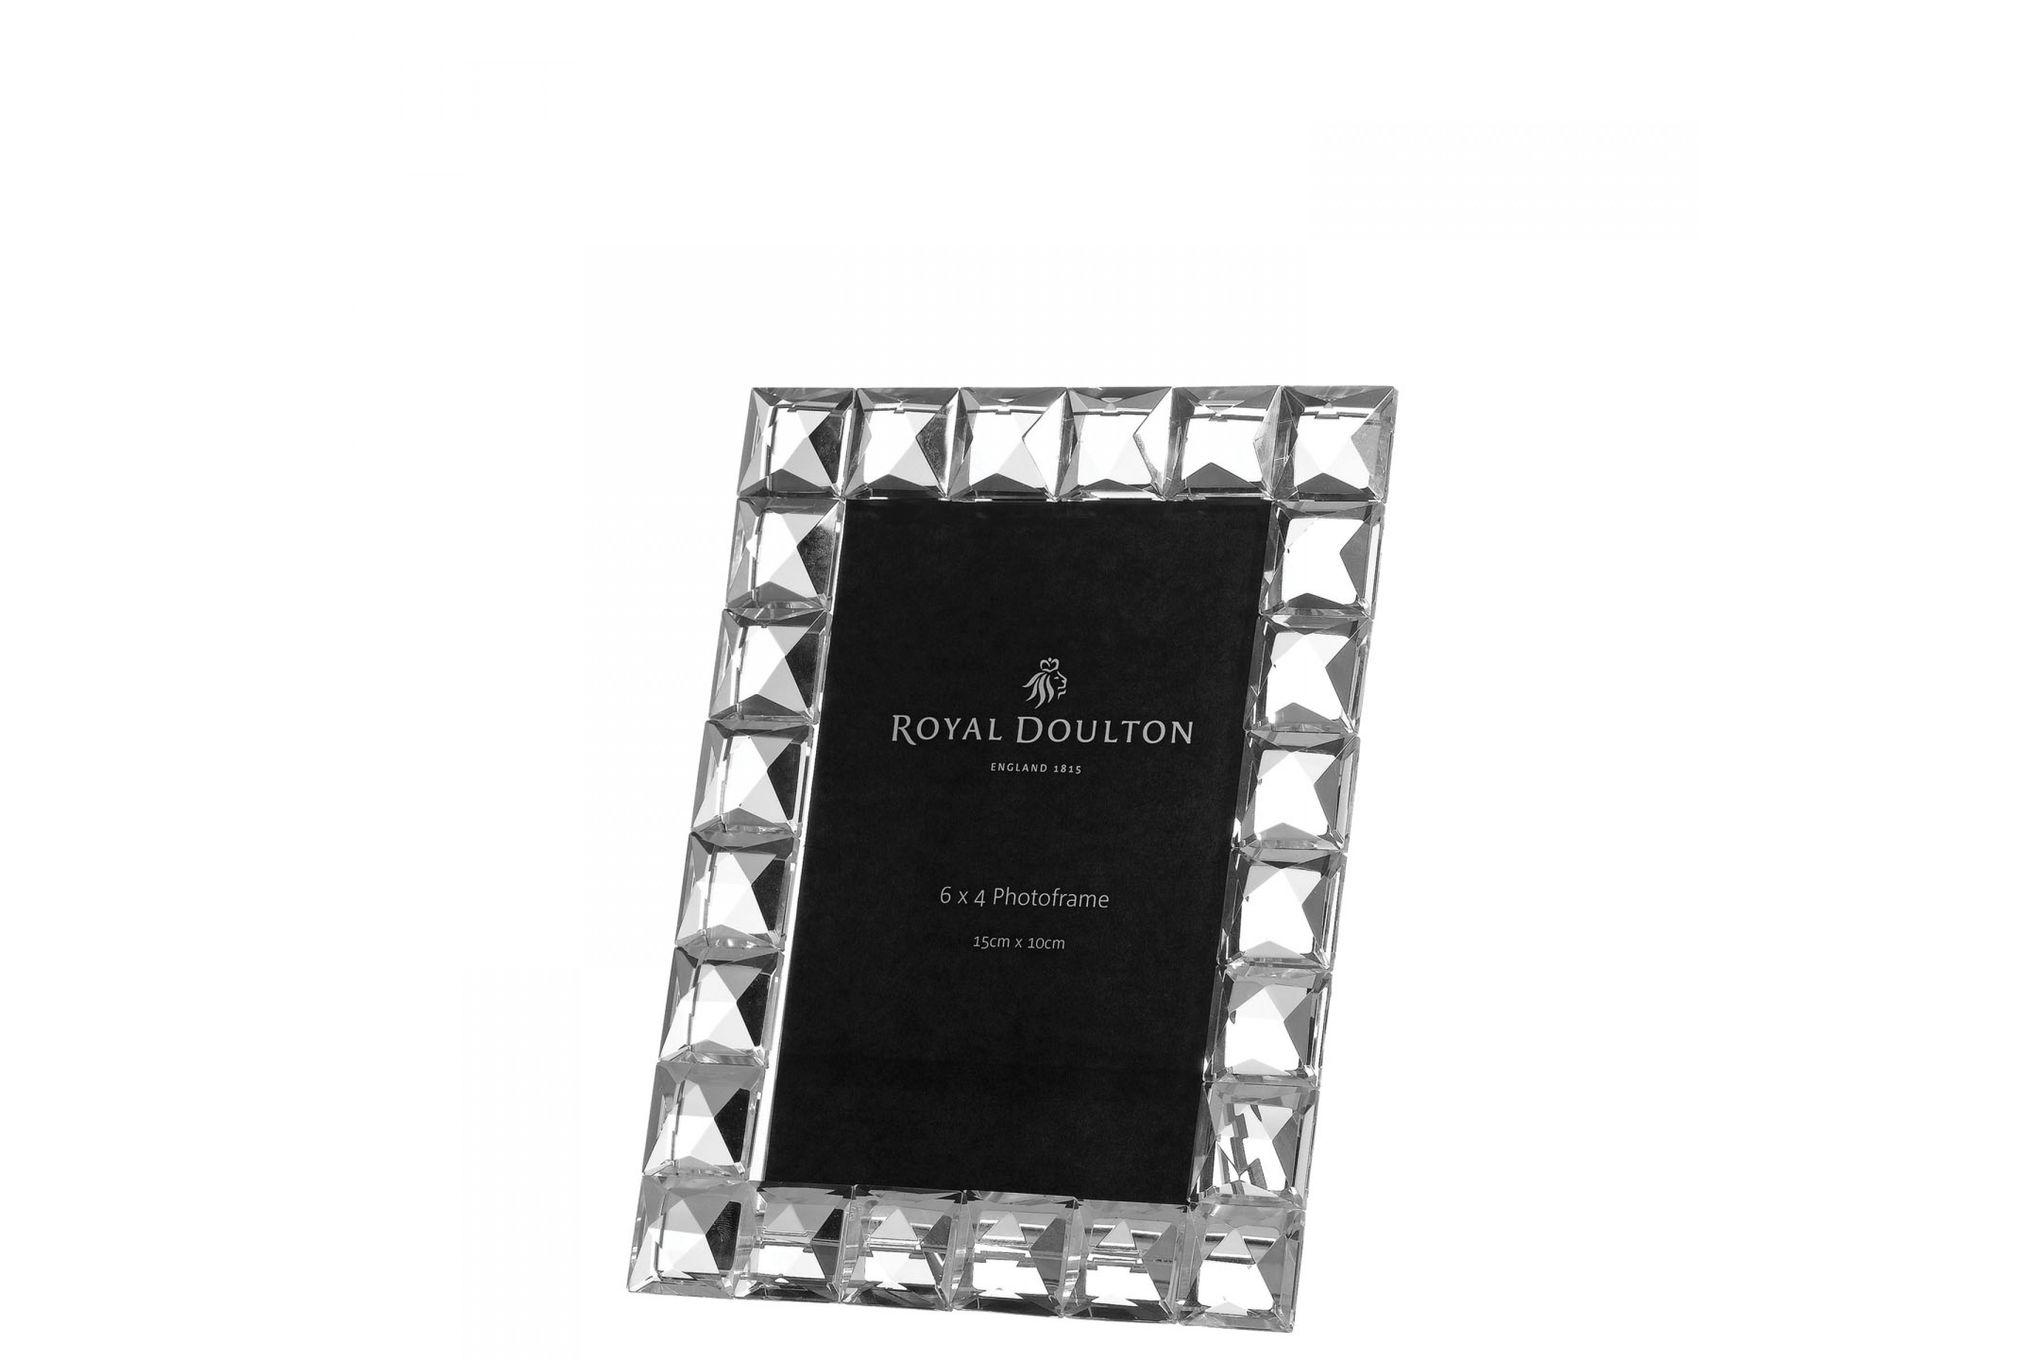 "Royal Doulton Radiance Diamond Photo Frame Boxed 6 x 4"" thumb 1"